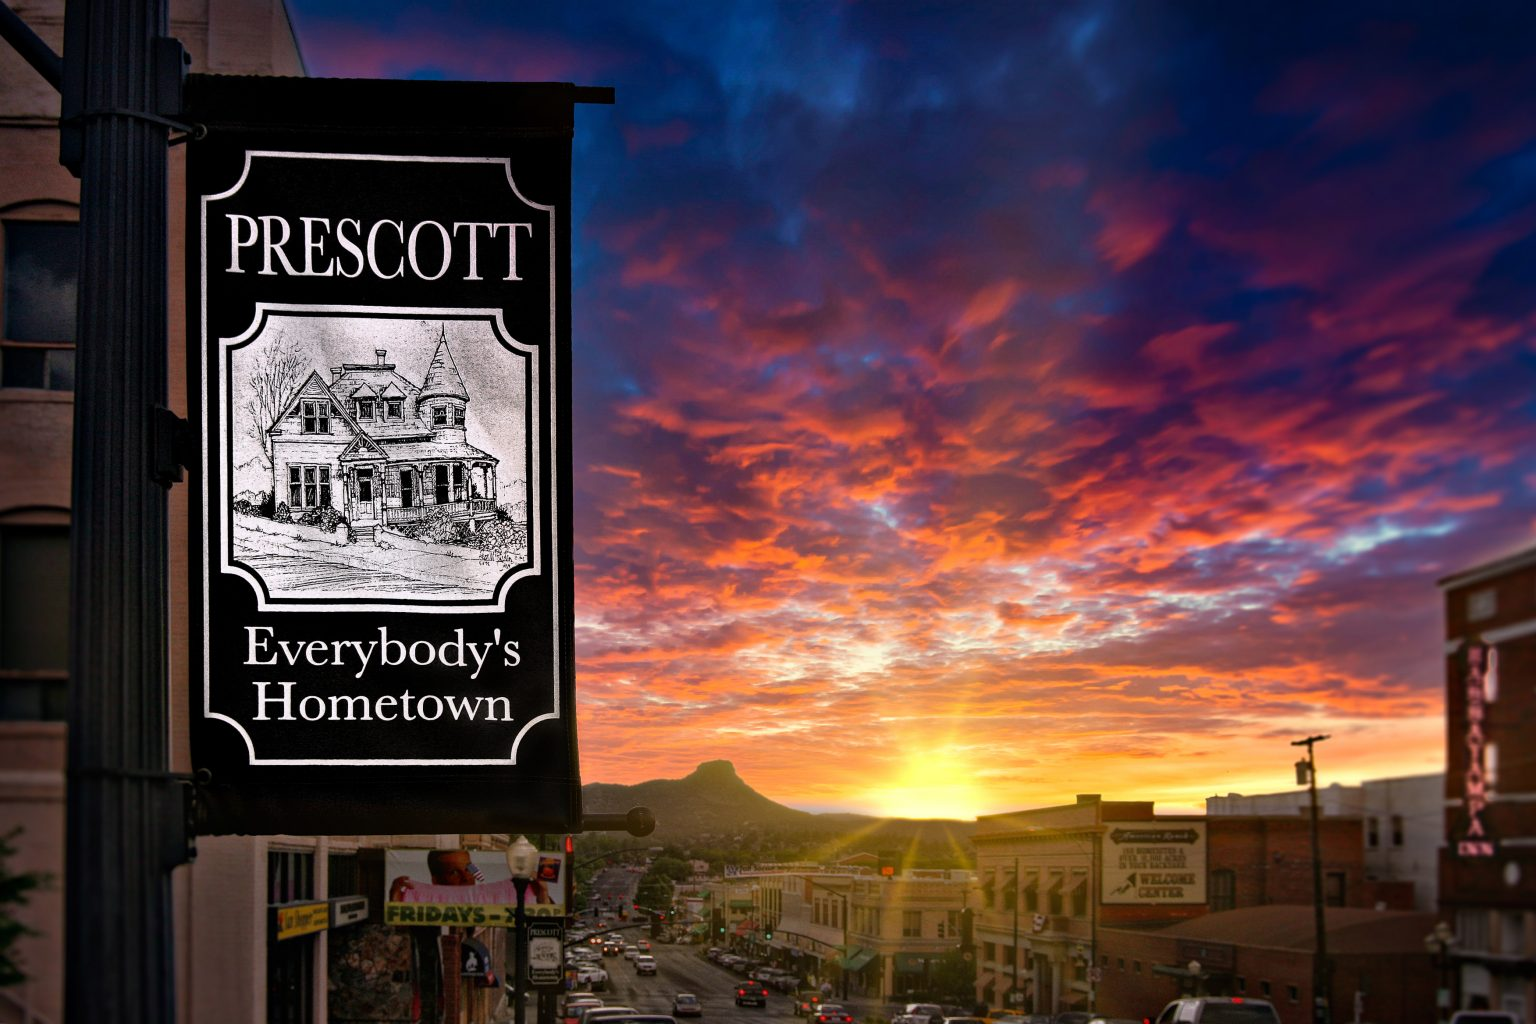 Prescott Everyone's Hometown